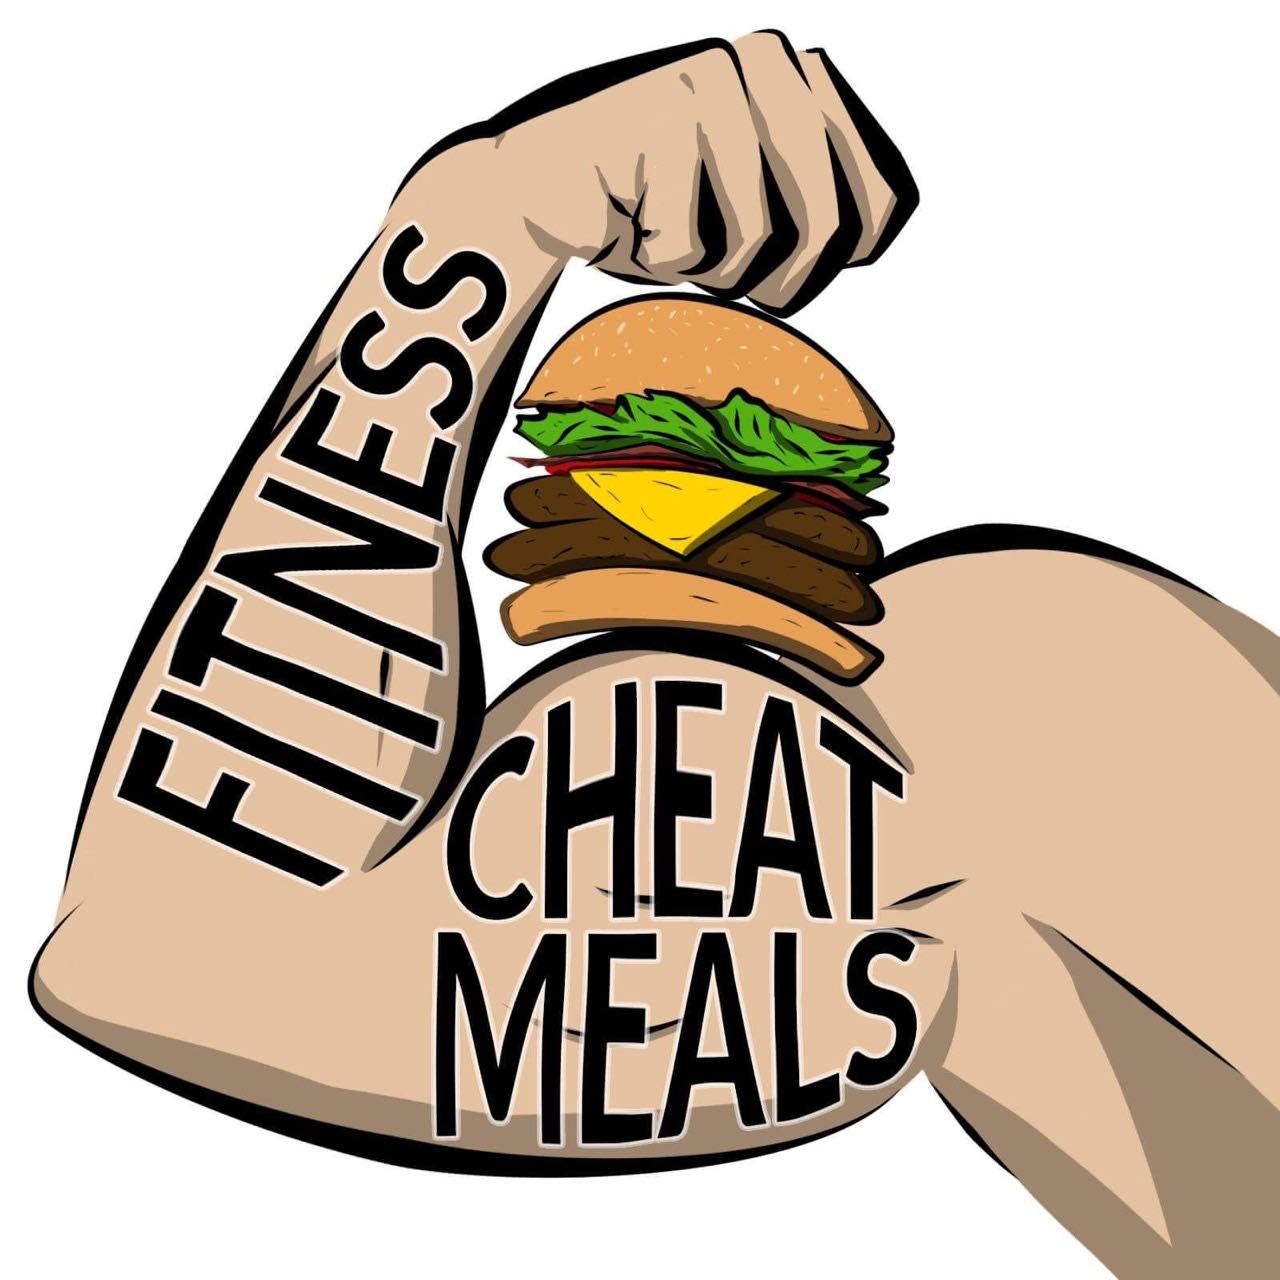 Photo of user: Fitnesscheatmeals